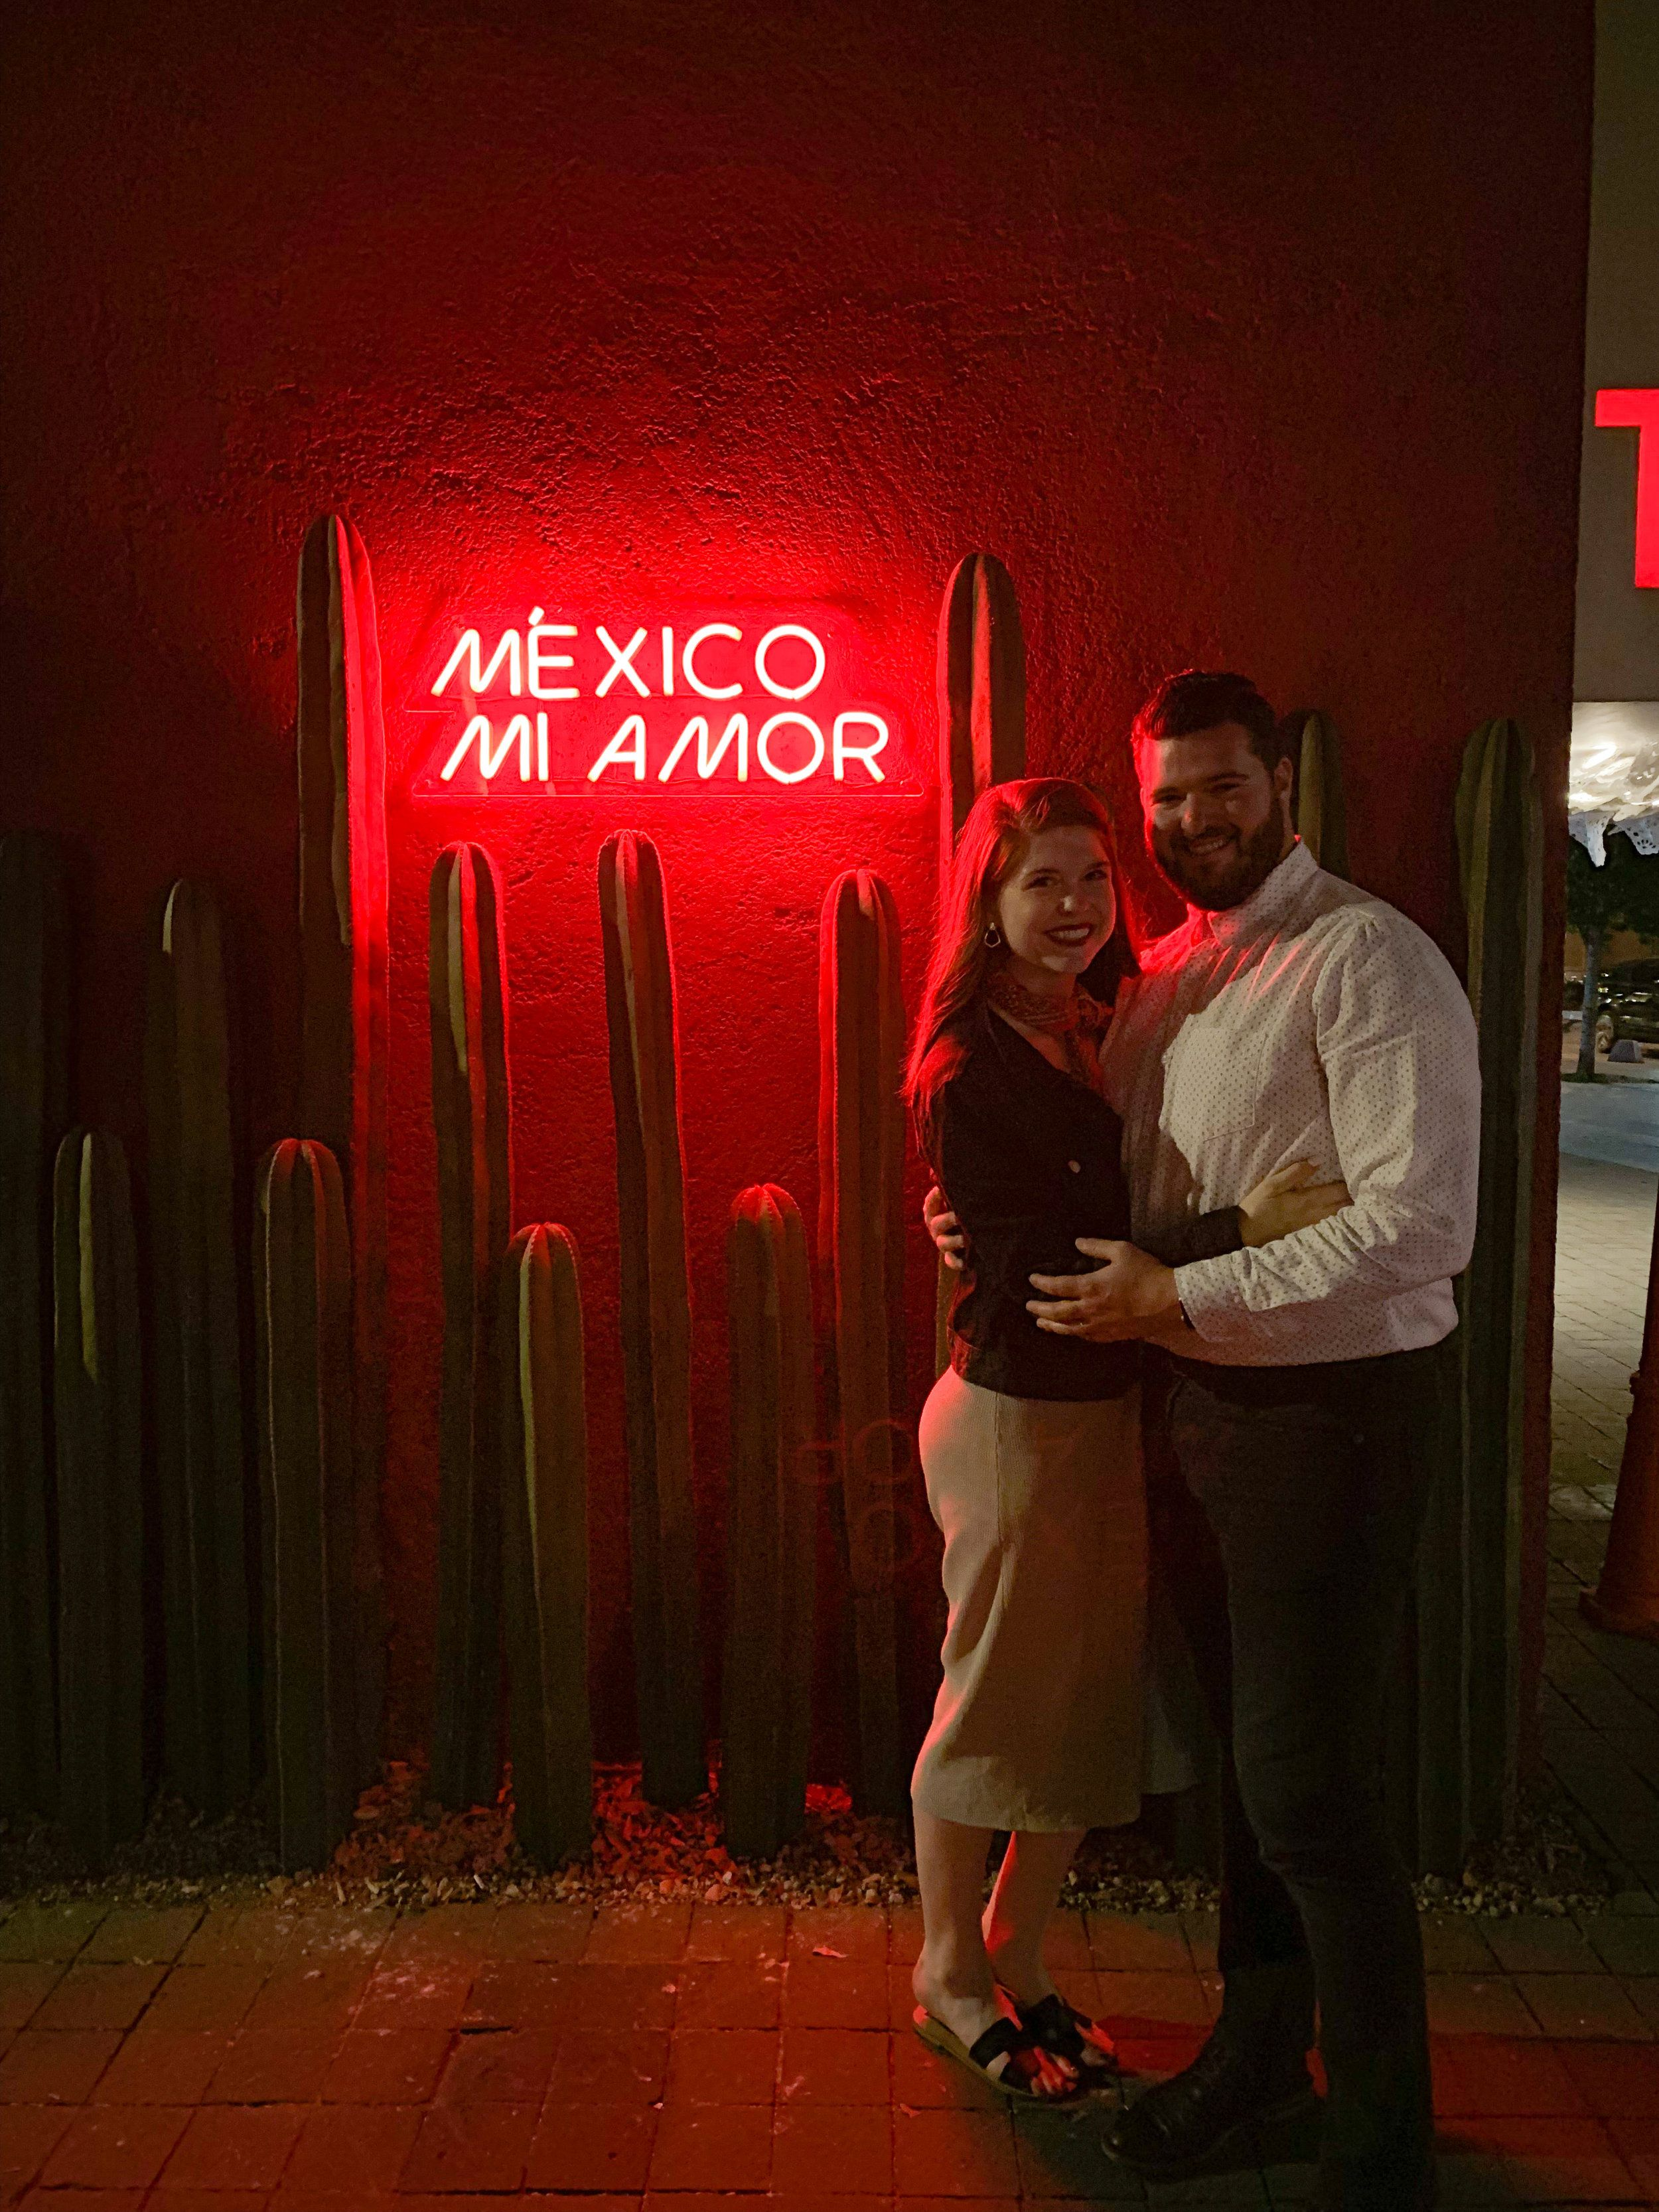 mexico city travel guide, what to do in mexico city, where to eat in mexico city, where to stay in mexico city, la ciudad de mexico, cdmx, cute neighborhoods near mexico city, polanco, mexico mi amor